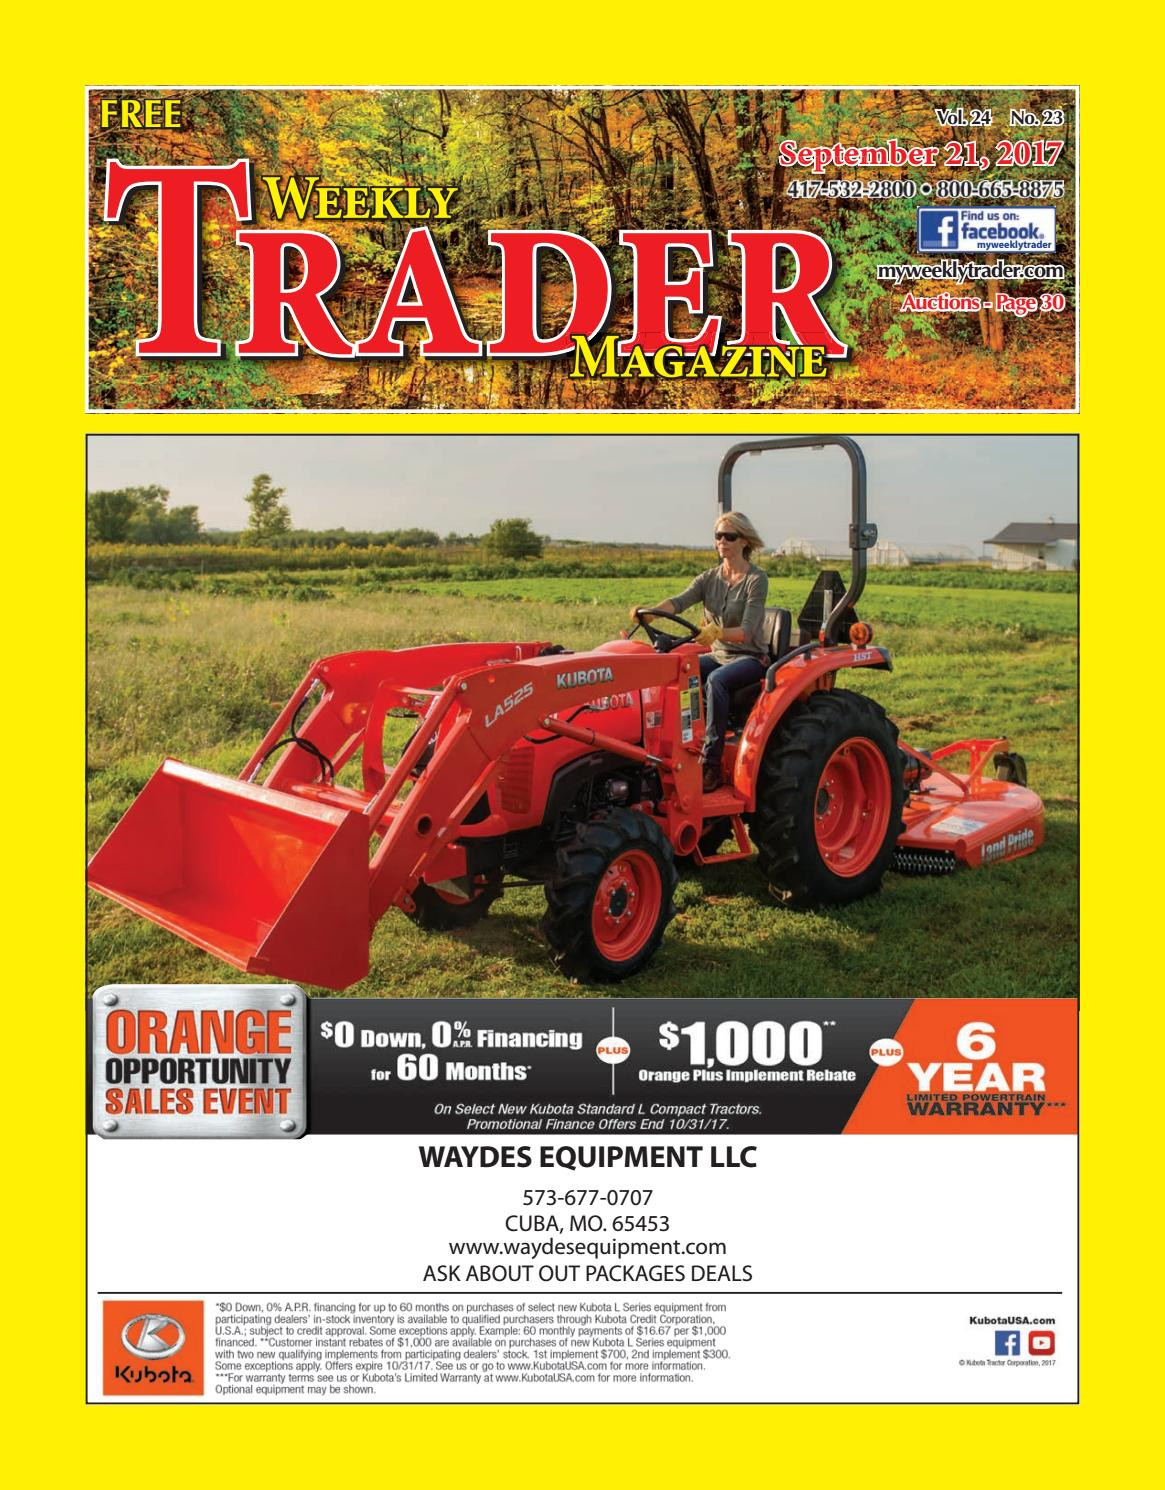 Weekly Trader September 21, 2017 by Weekly Trader - issuu